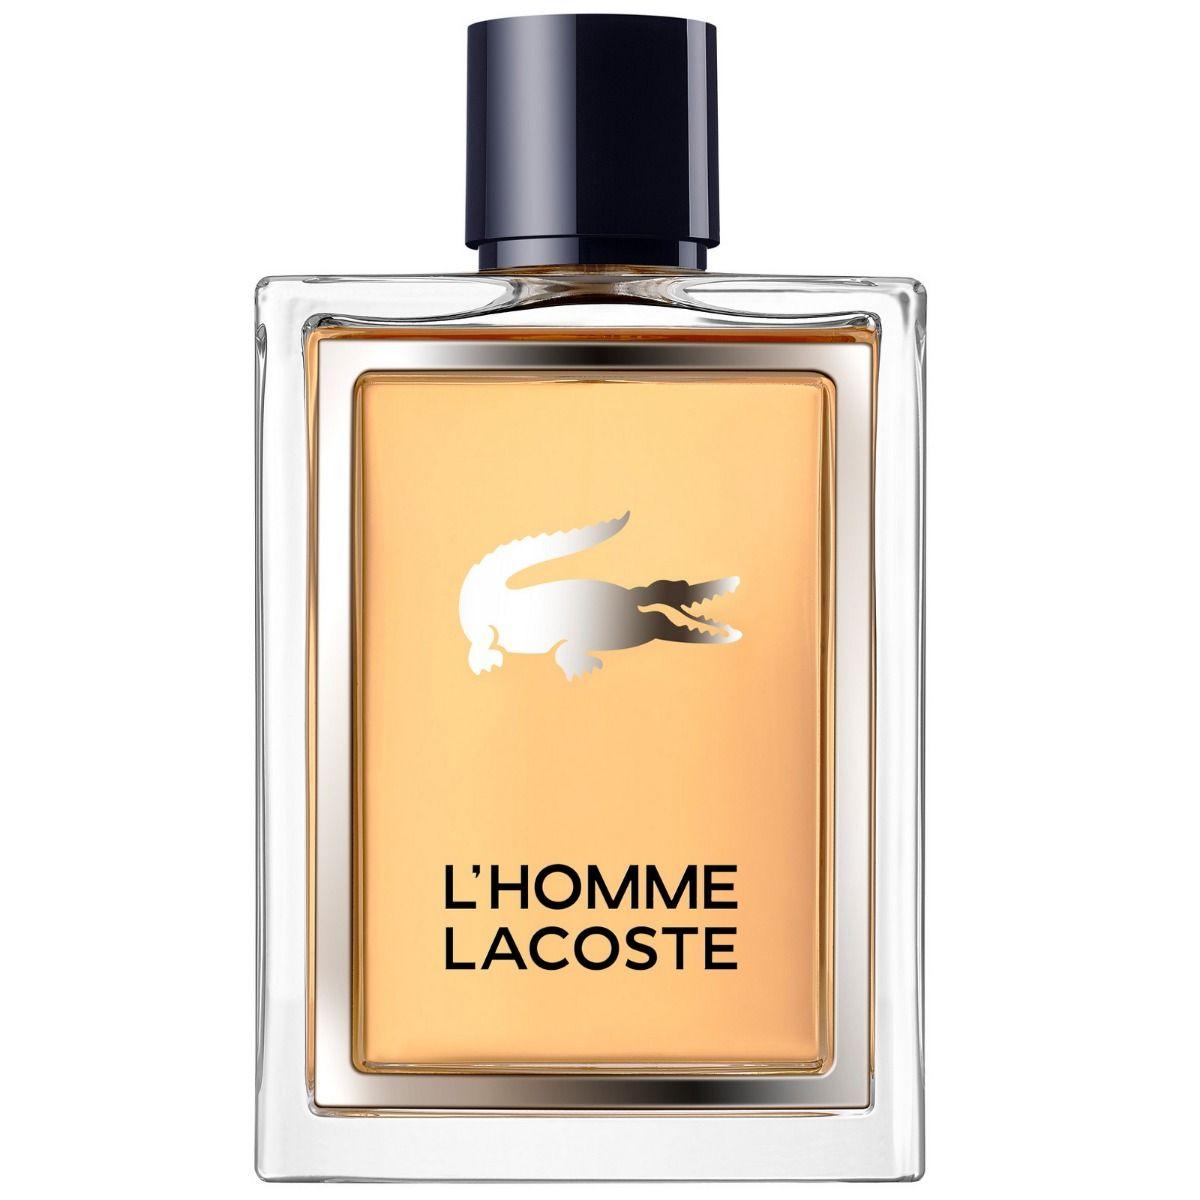 Lacoste L'Homme Edt 50ml